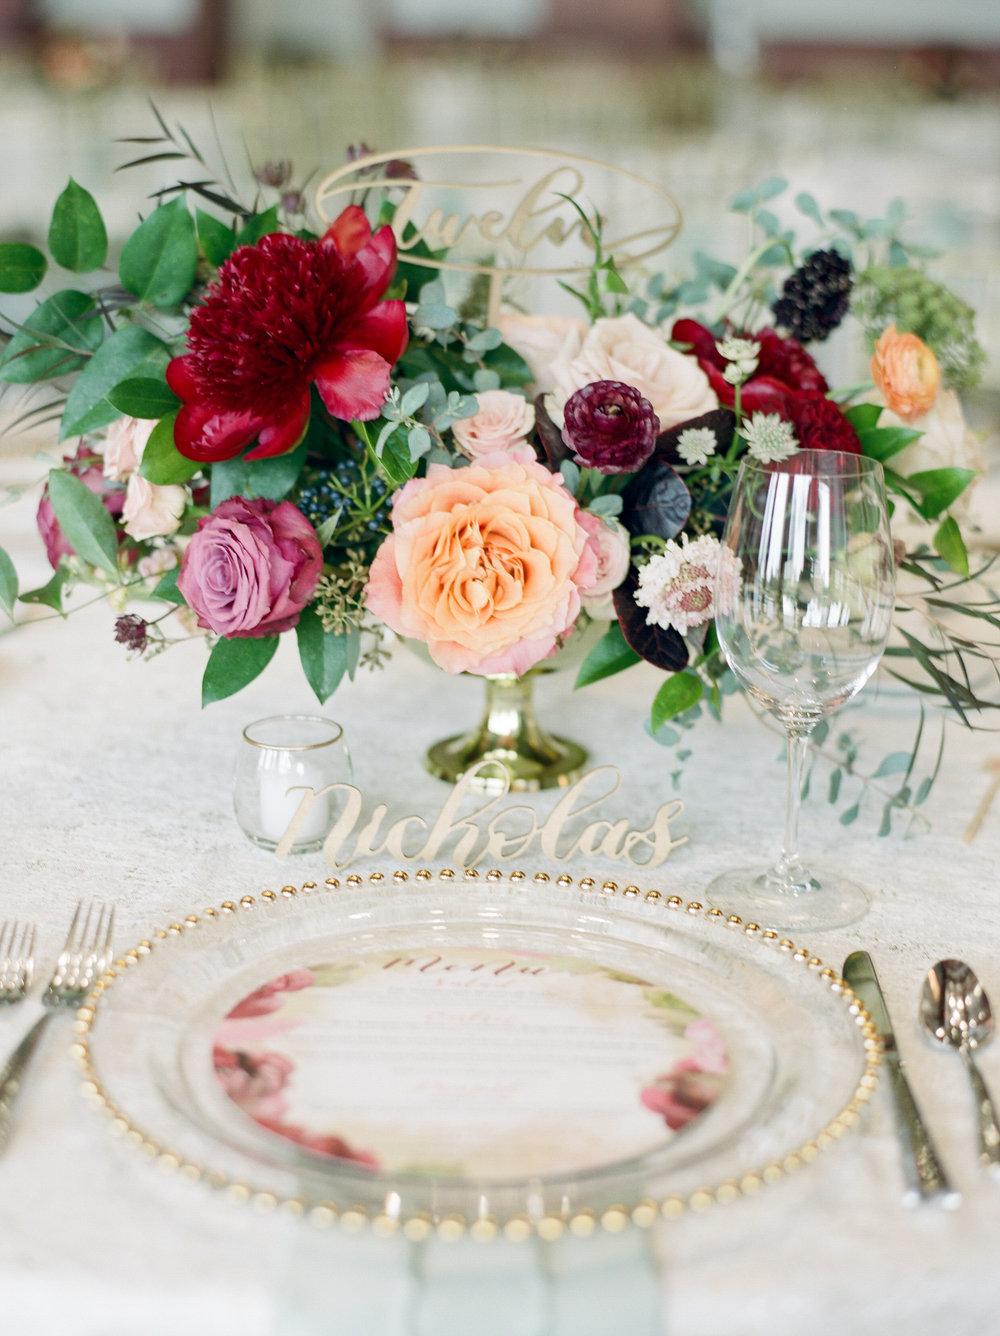 Houston-Wedding-Photographer-Fine-Art-Film-Destination-Style-Me-Pretty-Austin-Dallas-New-Orleans-Dana-Fernandez-Photography-The Woodlands-Country-Club-31.jpg